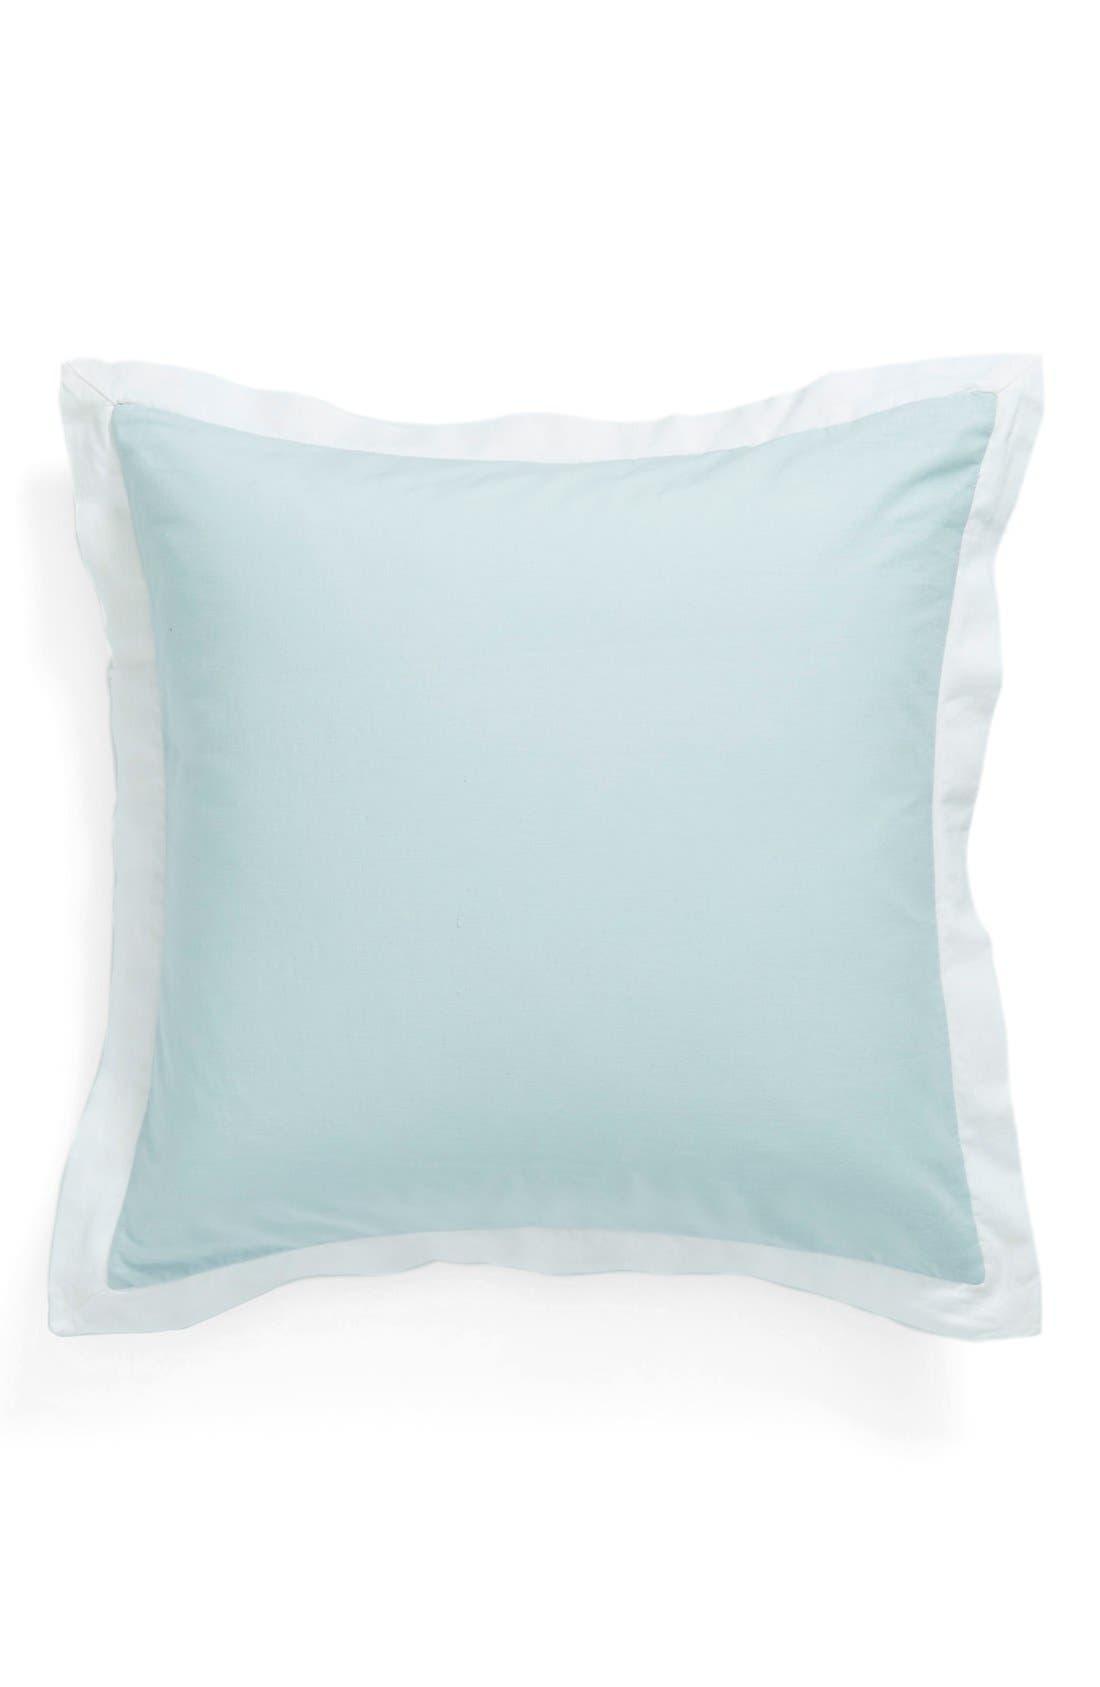 'Spa' Washed Linen Euro Sham,                             Main thumbnail 1, color,                             Blue